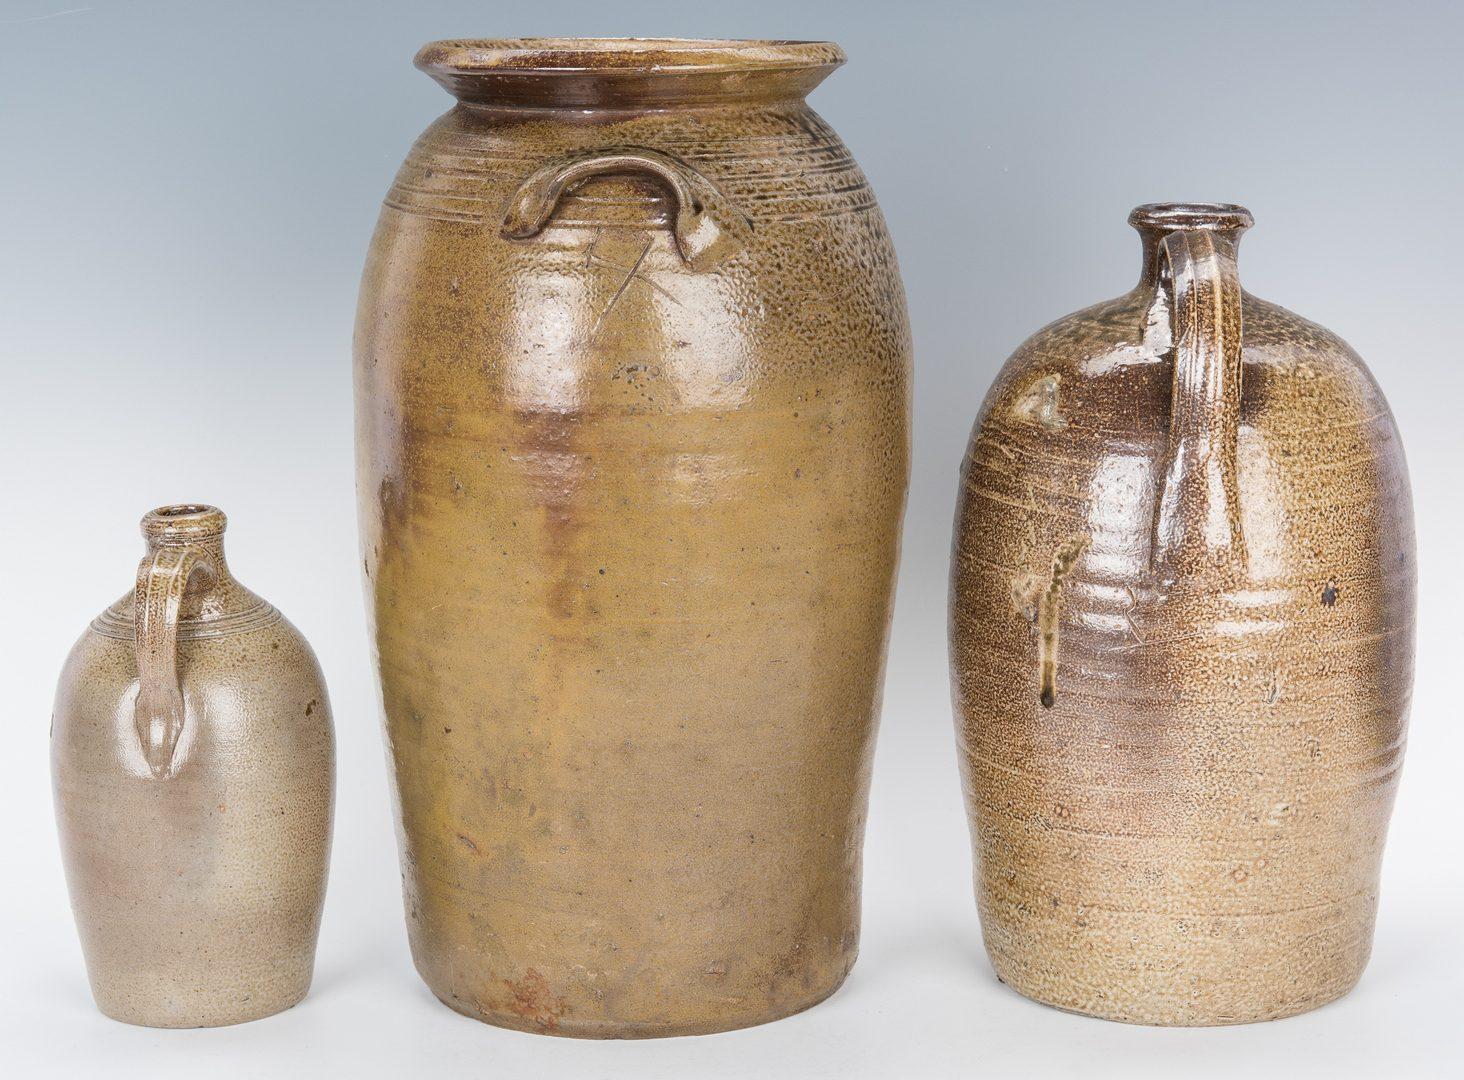 Lot 590: 3 North Carolina Salt-Glazed Pottery Items